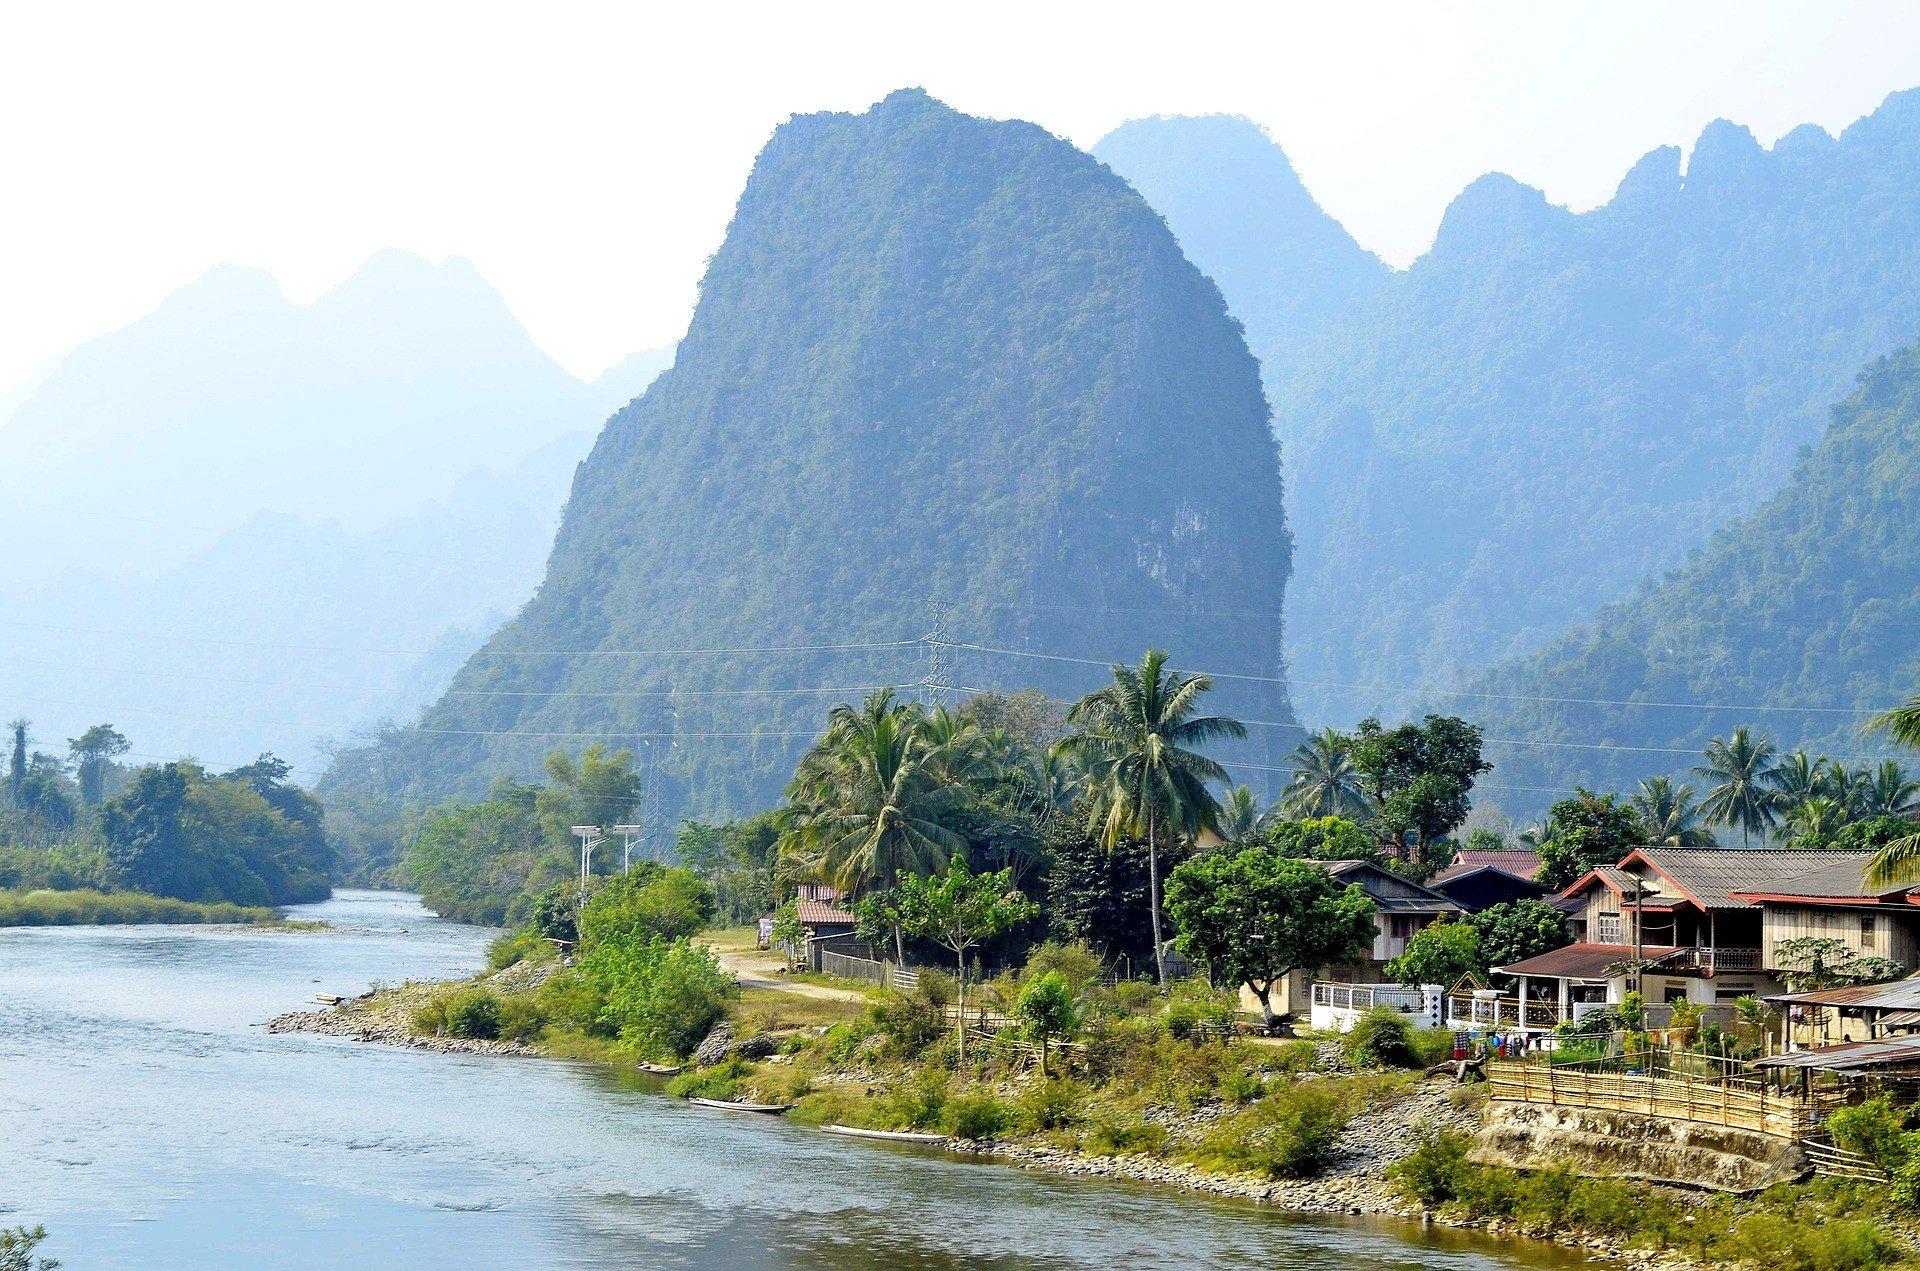 Riverside in Nong Khiaw